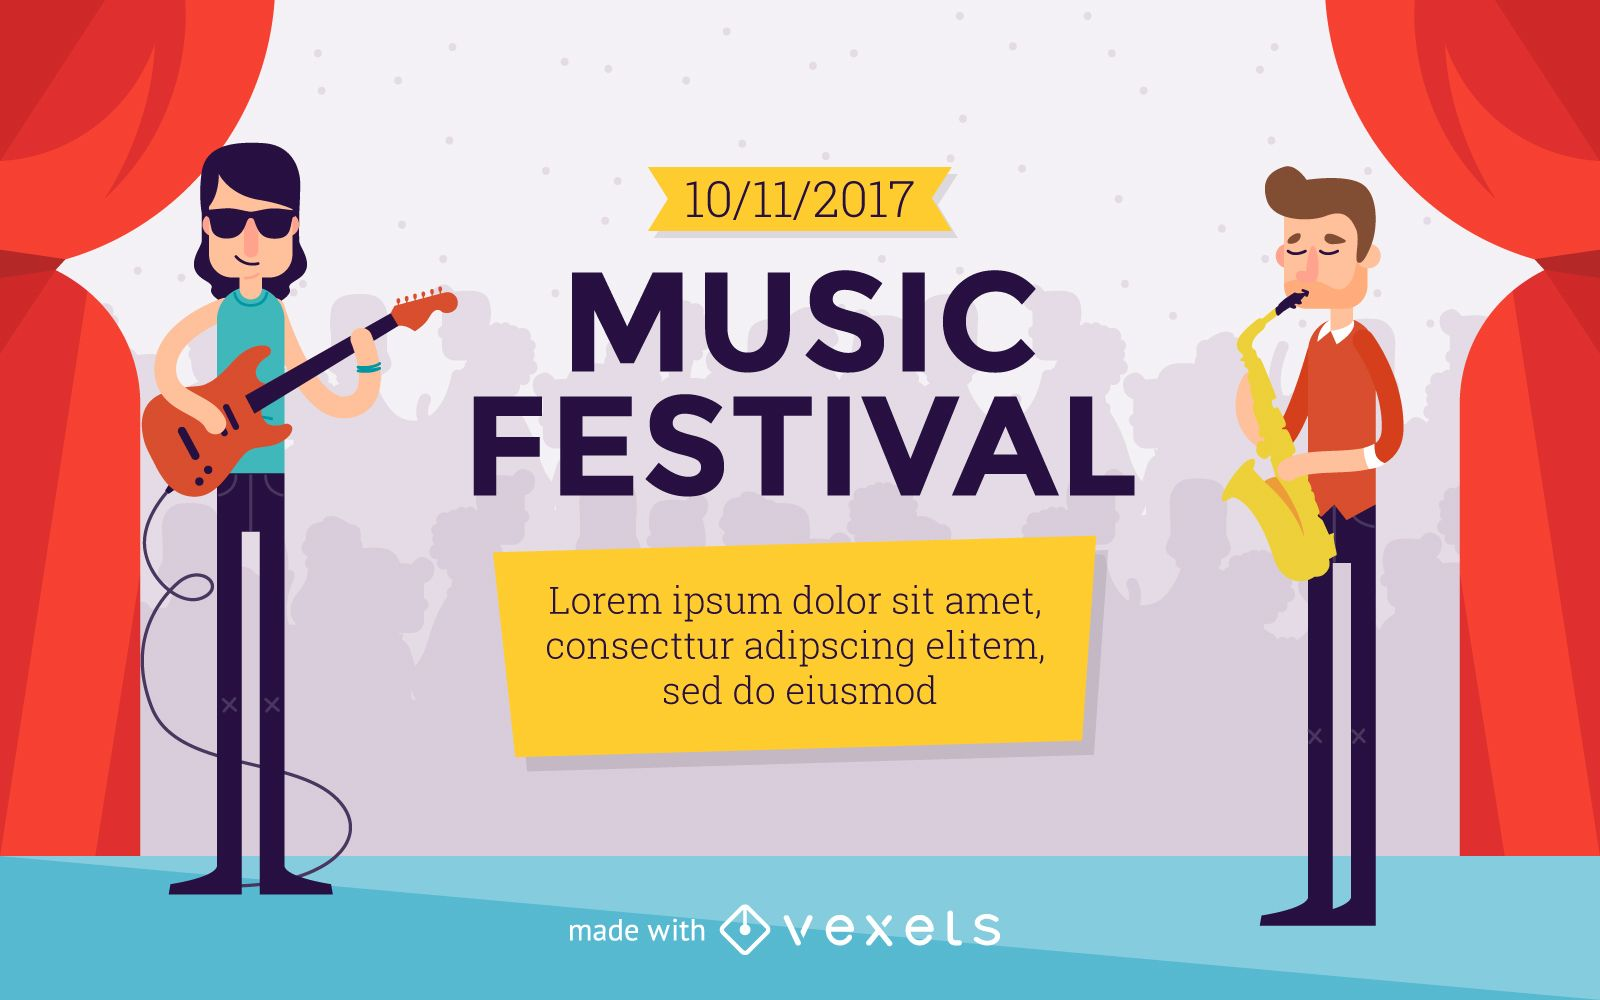 Creador de carteles del Festival de Música